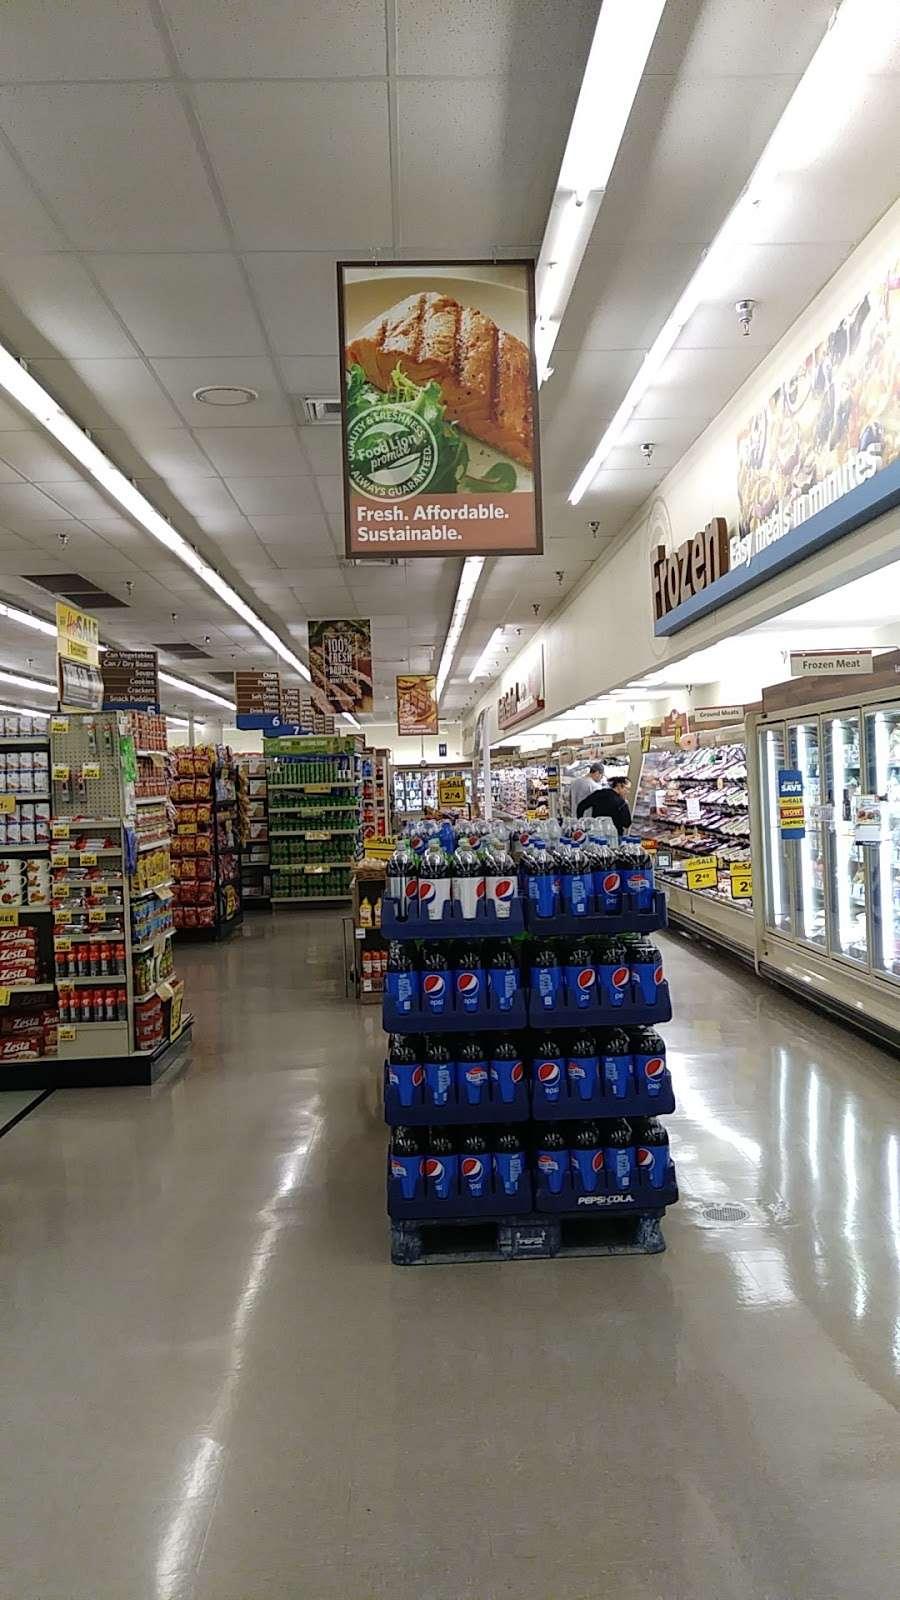 Food Lion - store  | Photo 2 of 10 | Address: 709 E McGregor St, Pageland, SC 29728, USA | Phone: (843) 672-7677